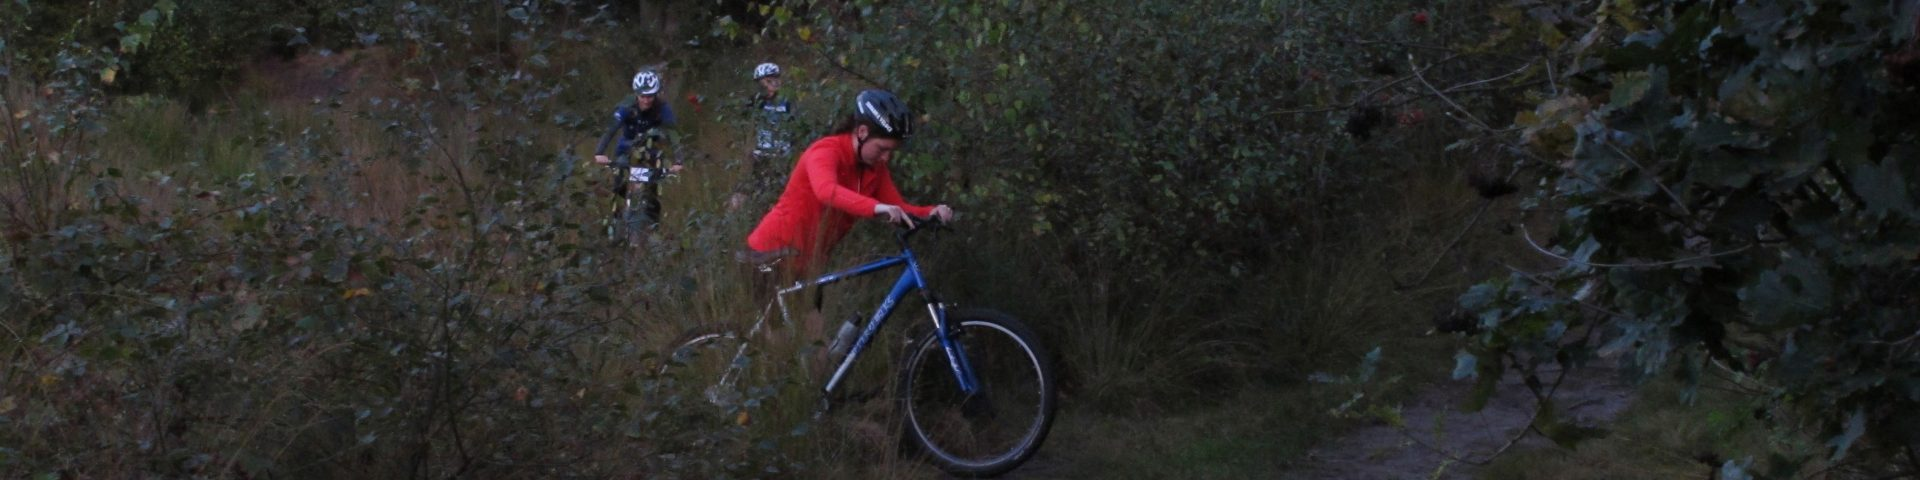 Time for mountain biking!